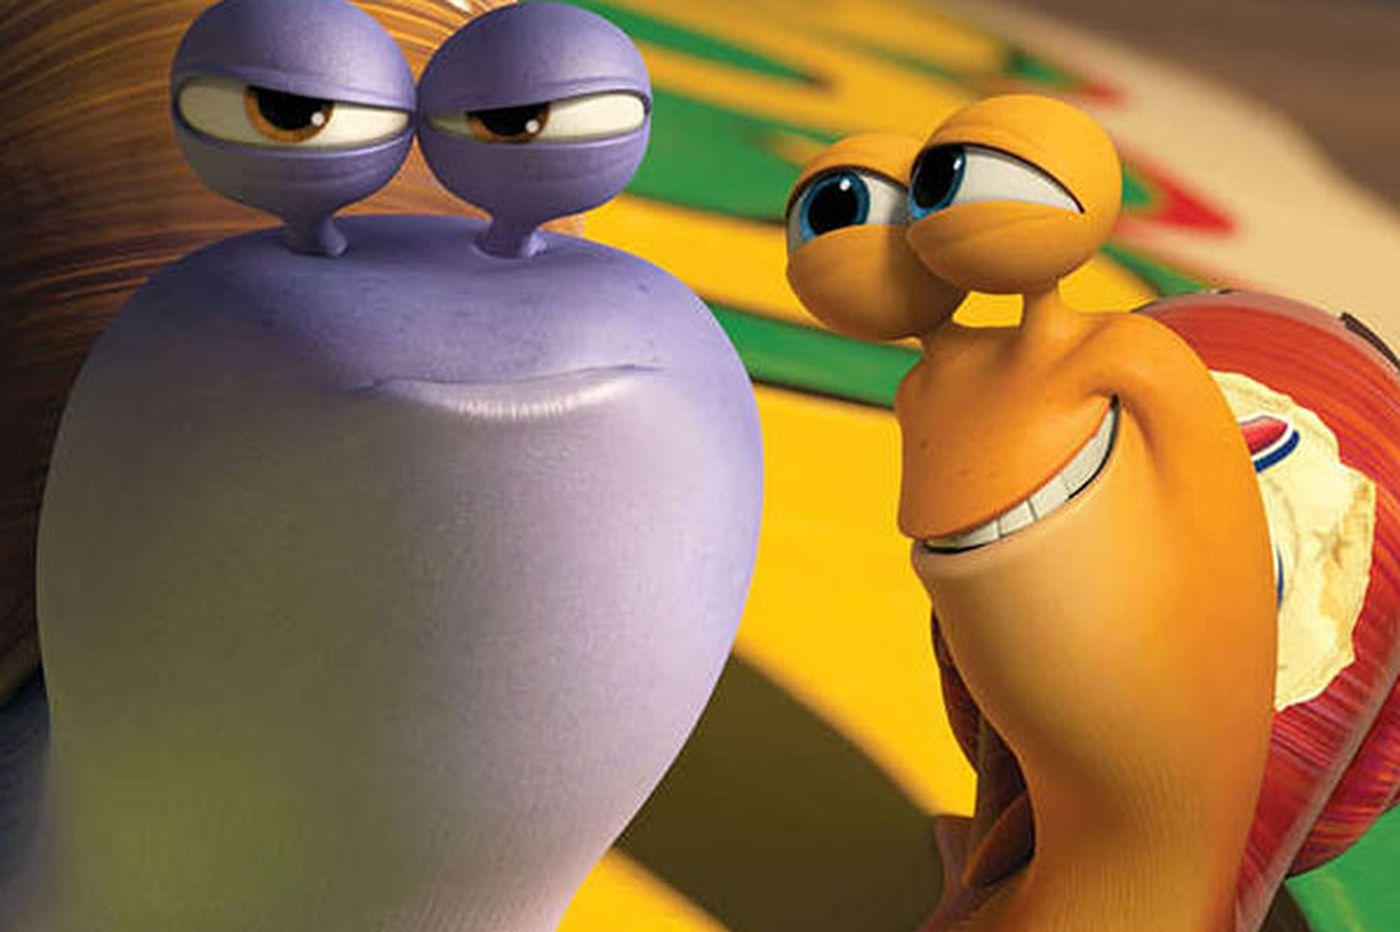 'Turbo': Fast, colorful, so-so kids' stuff